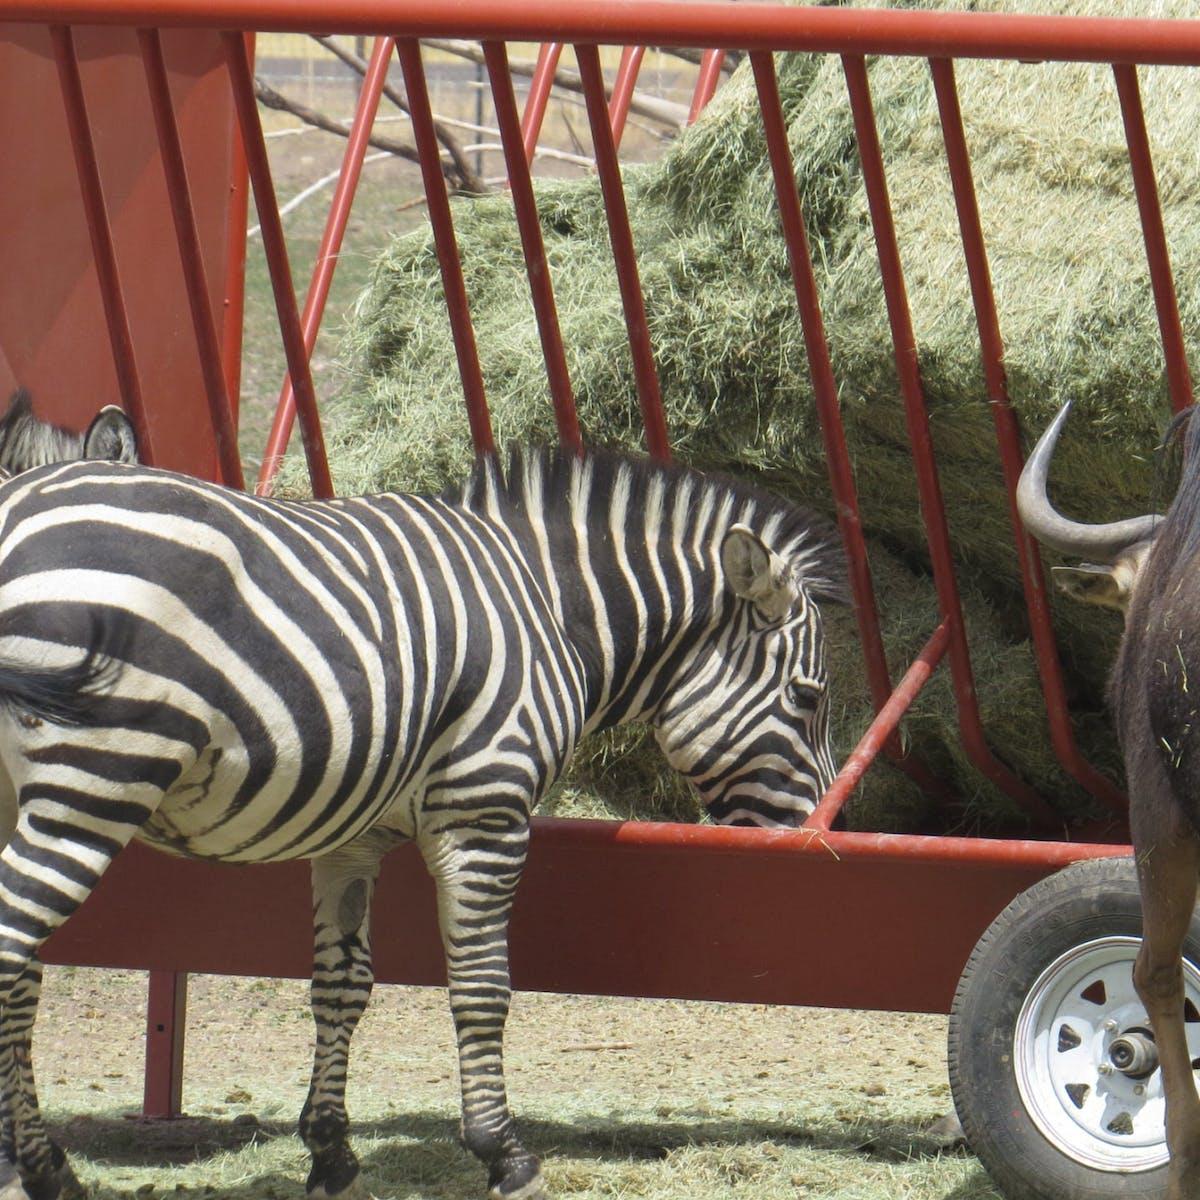 a zebra standing next to a fence